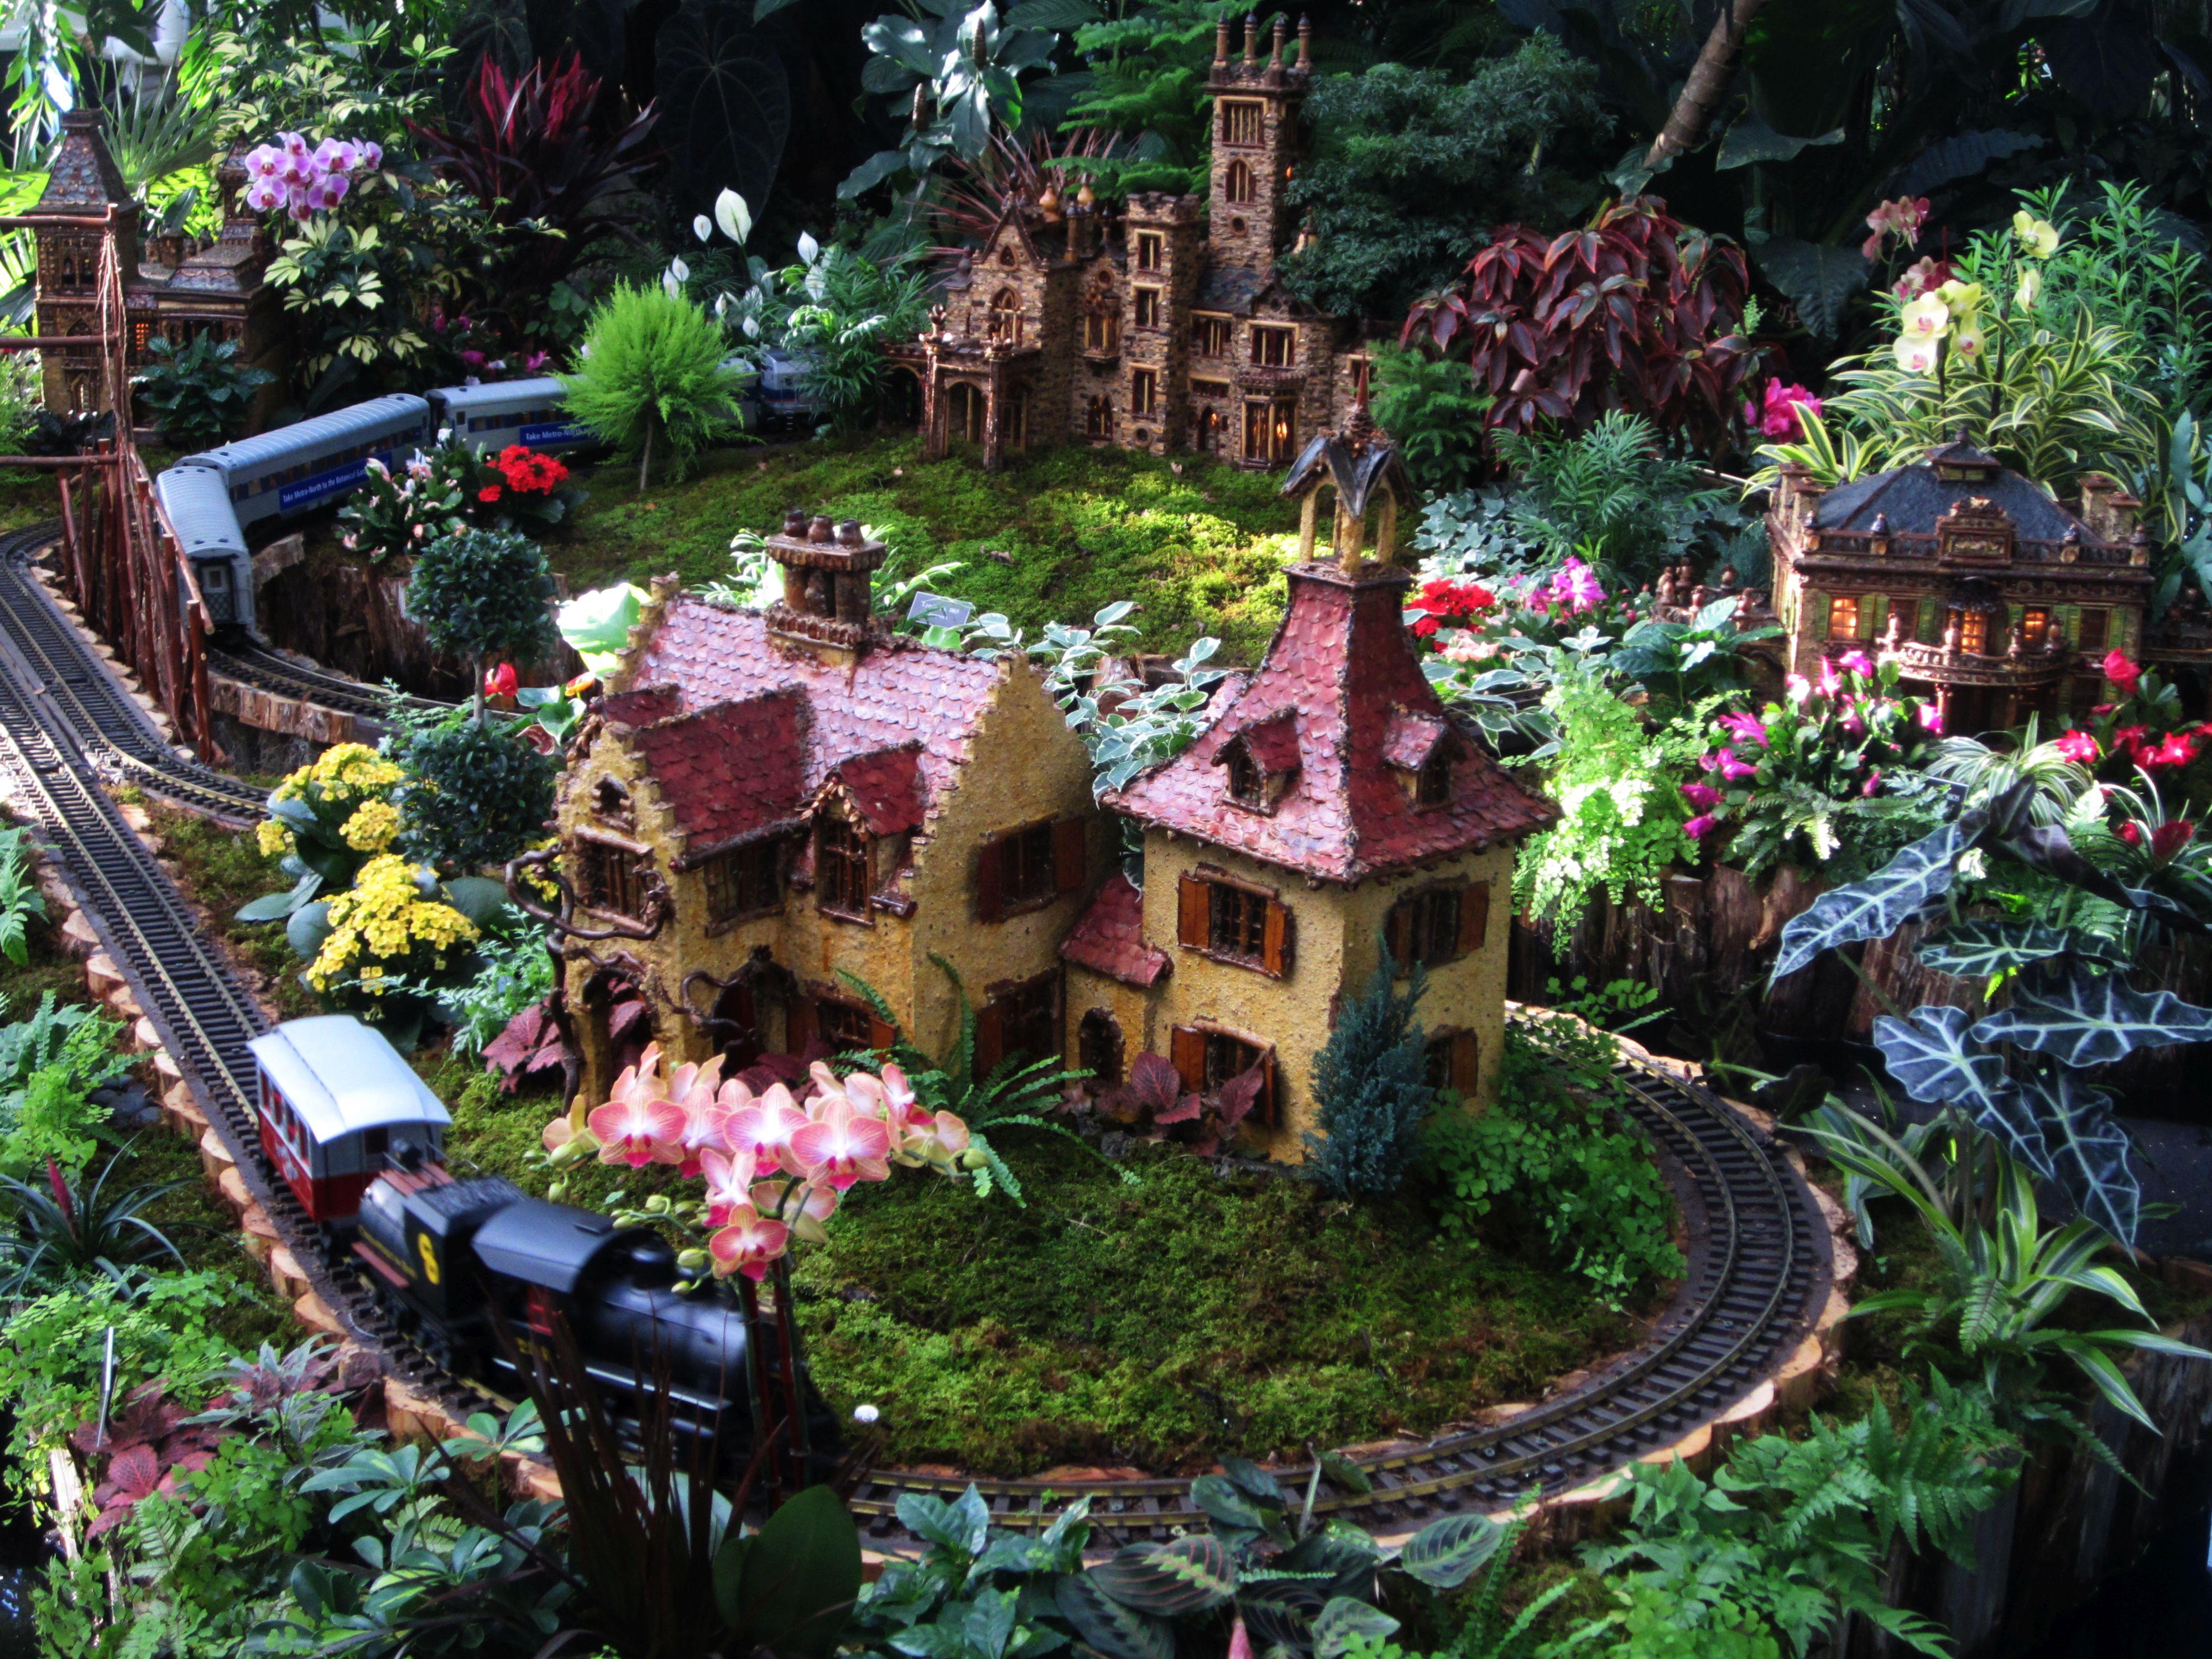 Holiday Train Show New York Botanical Garden Tombarat Photoblog